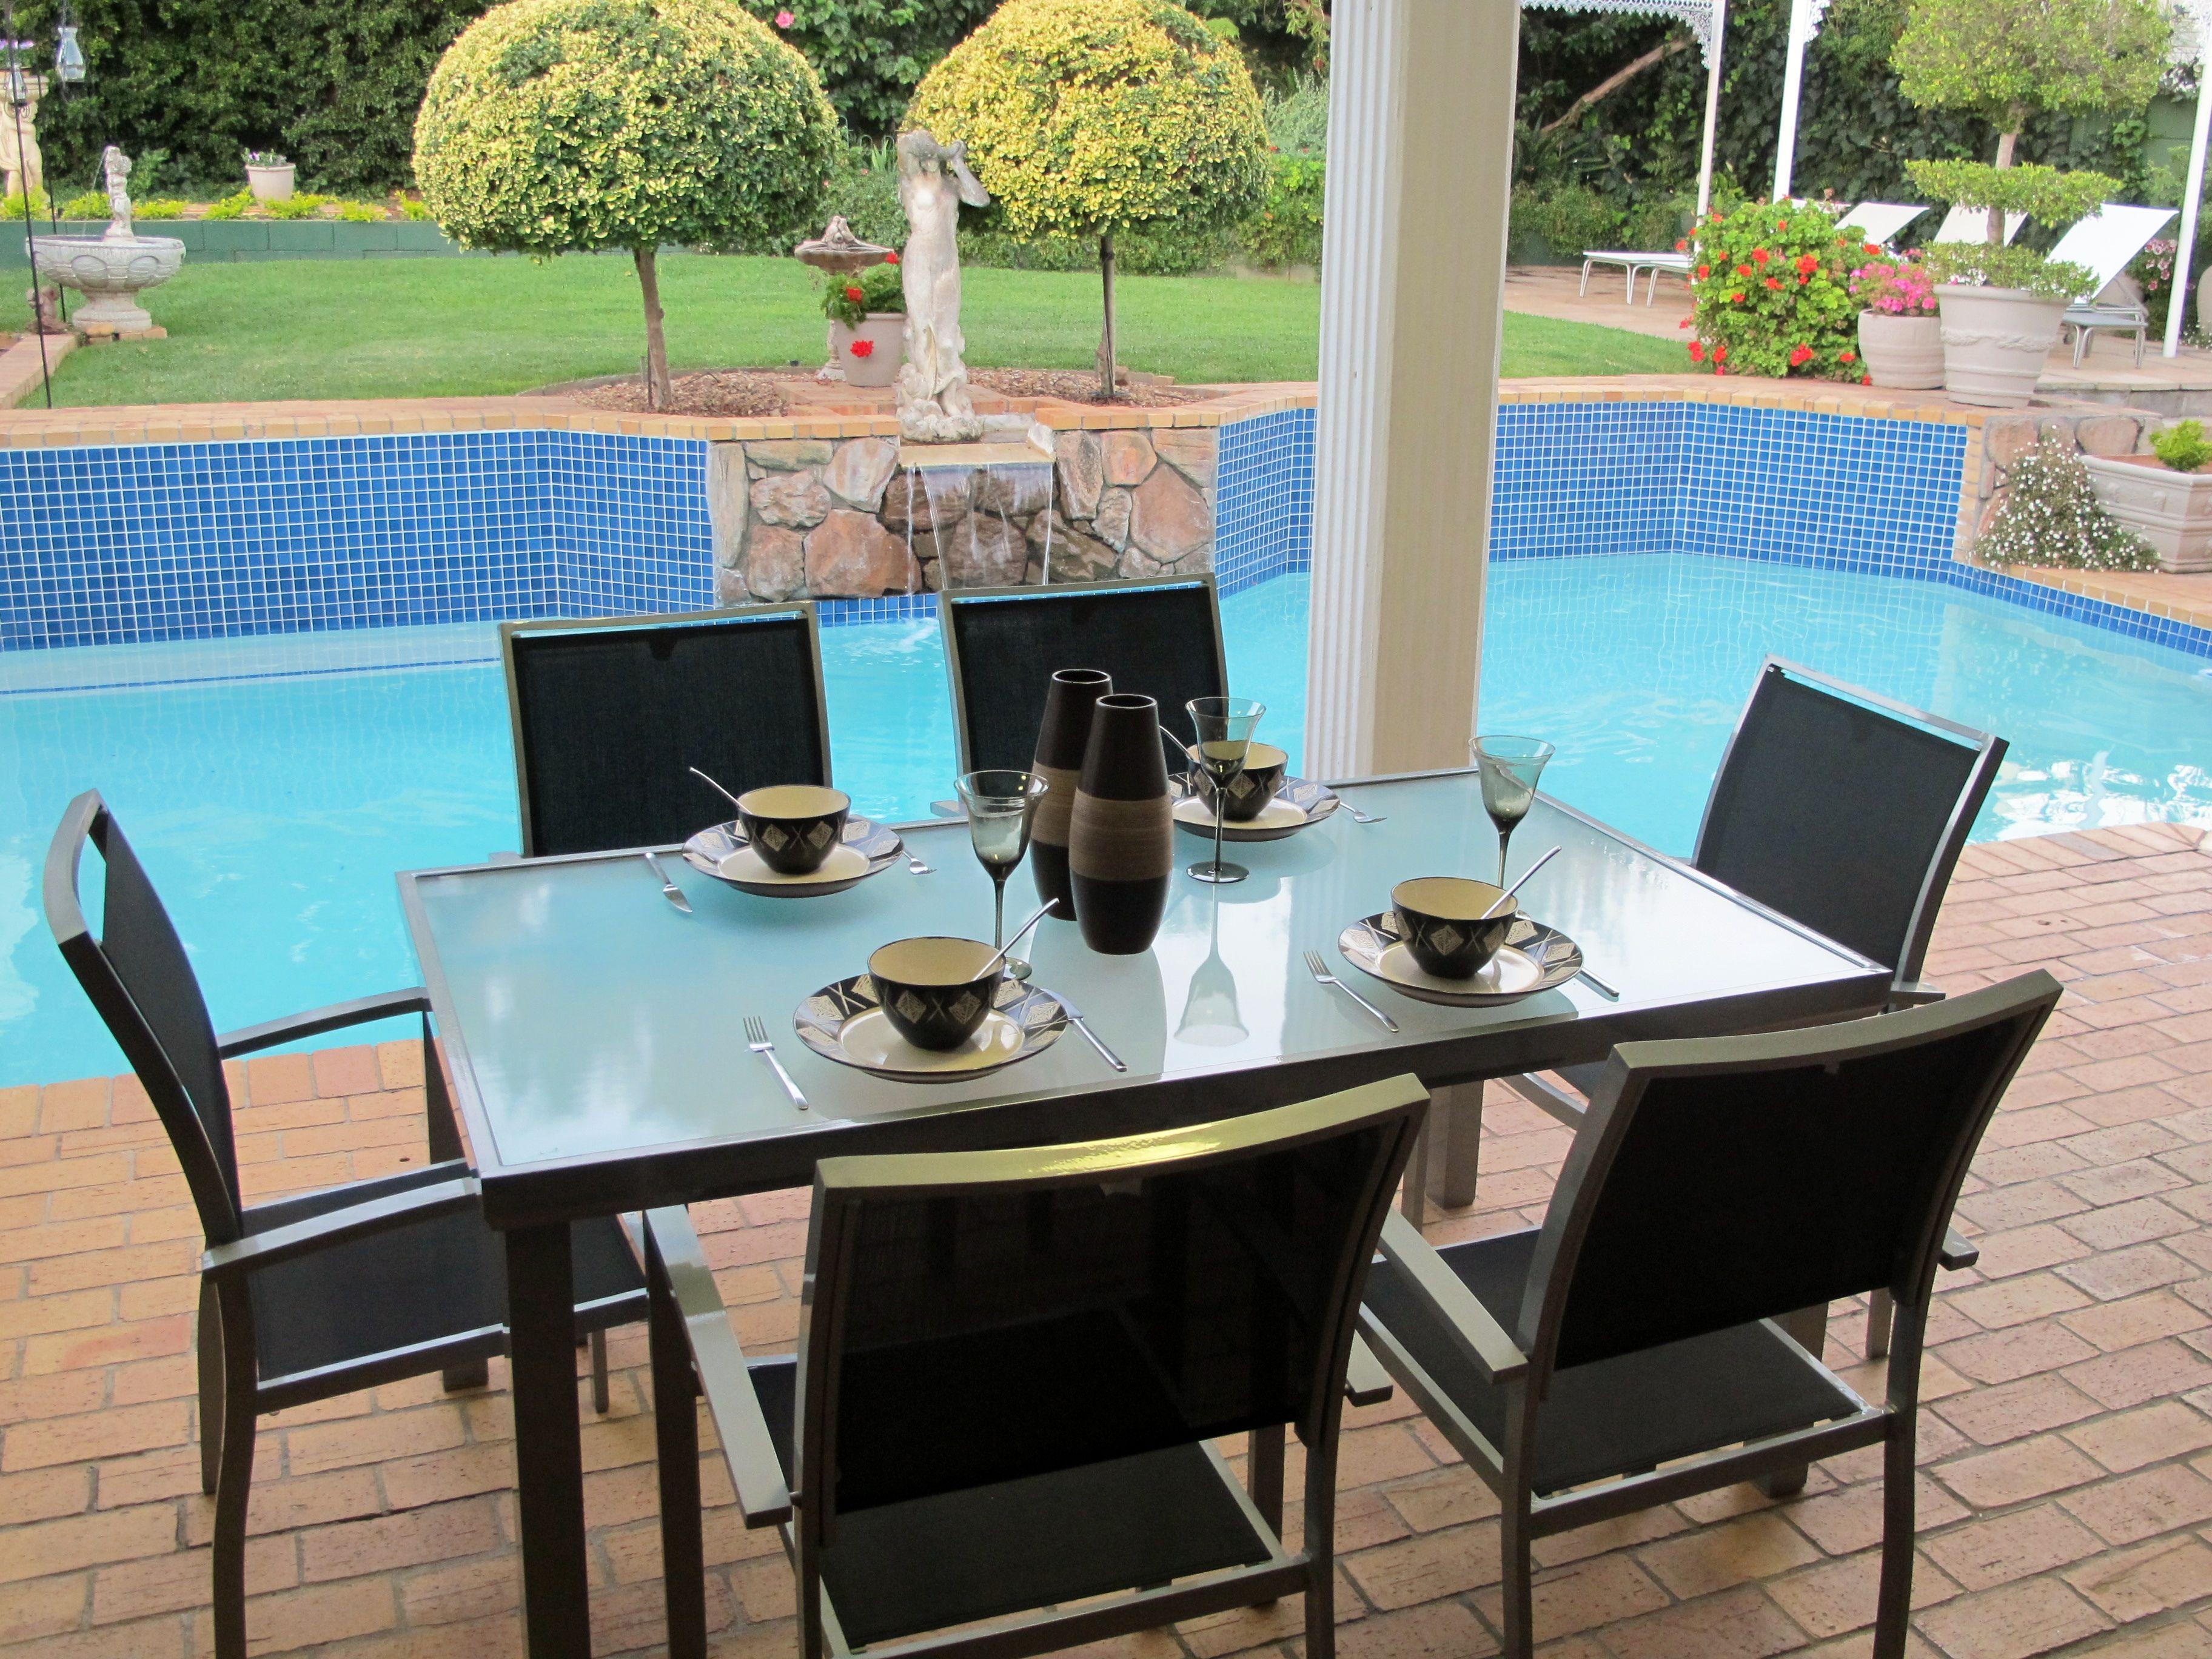 Tendo Outdoor 6 Seater Dining Set. | Outdoor Living & Creative ...